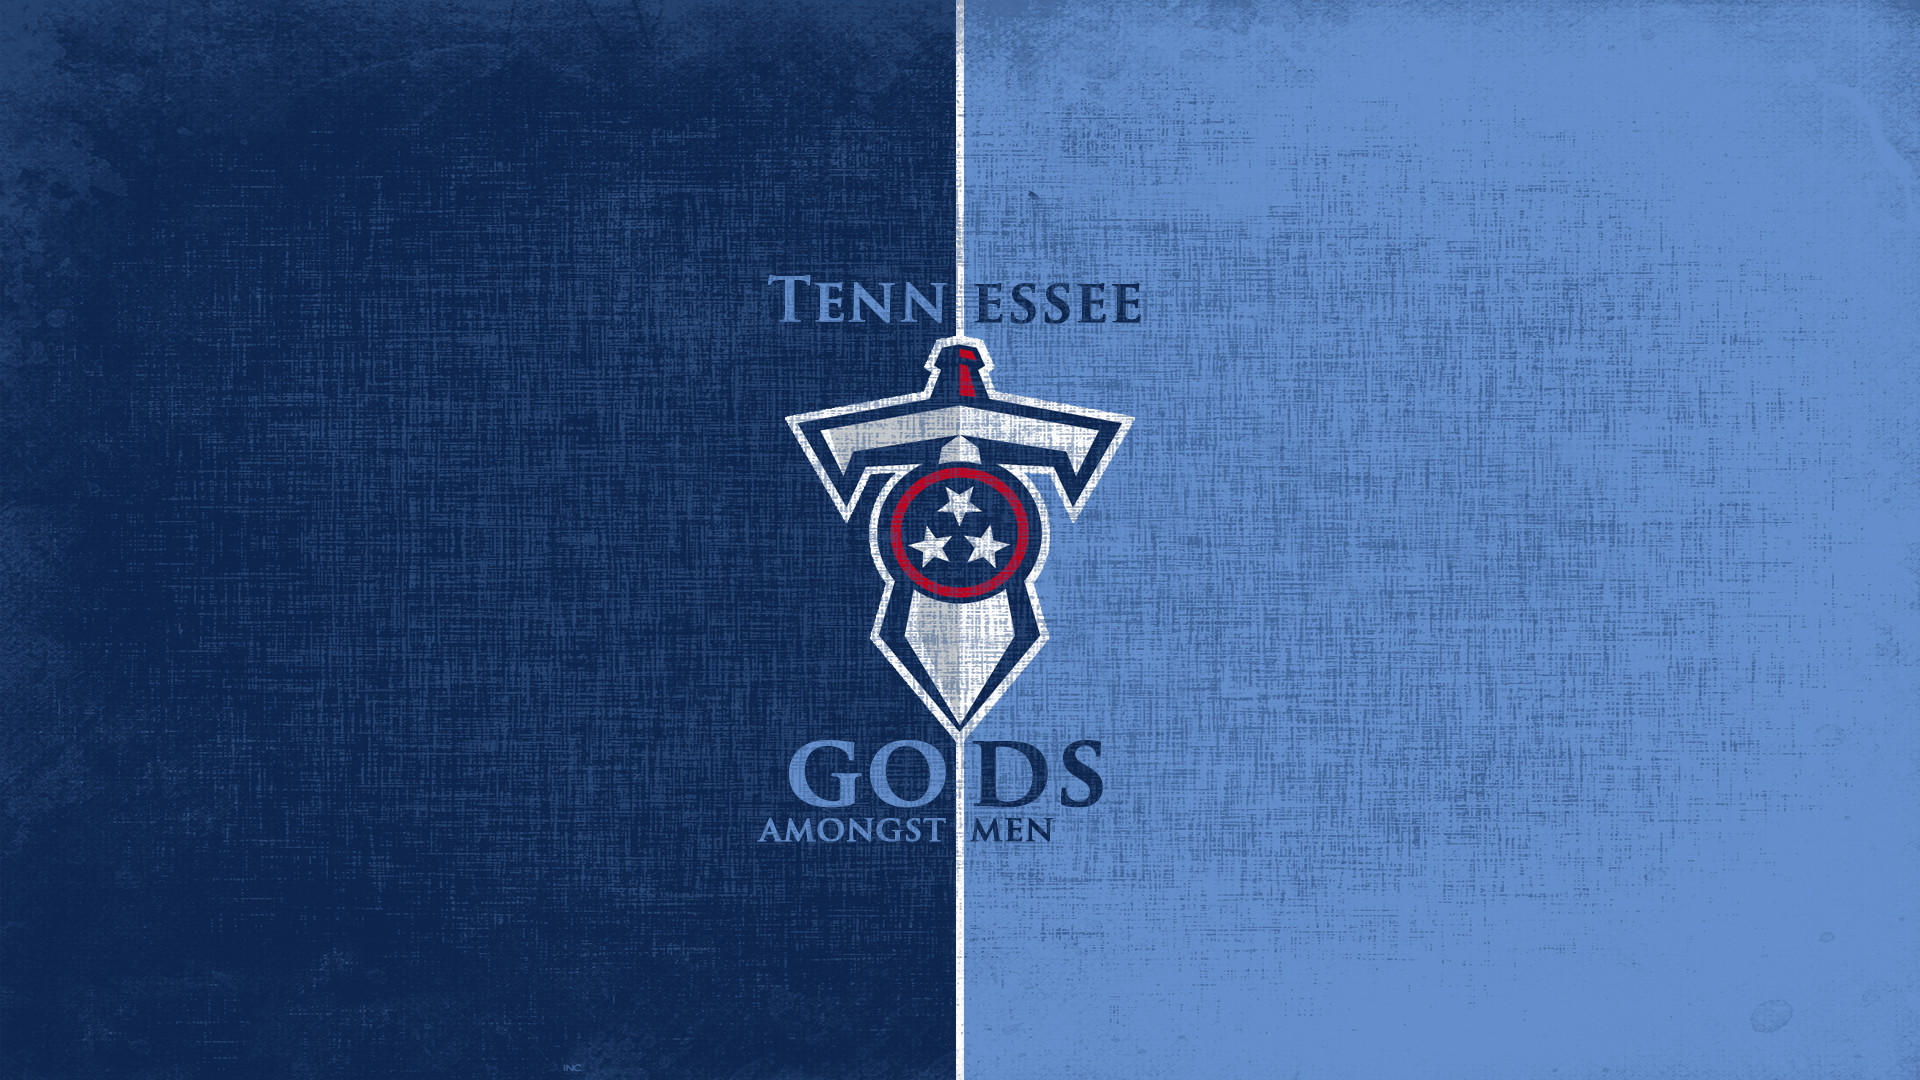 tennessee titans wallpaper 14742